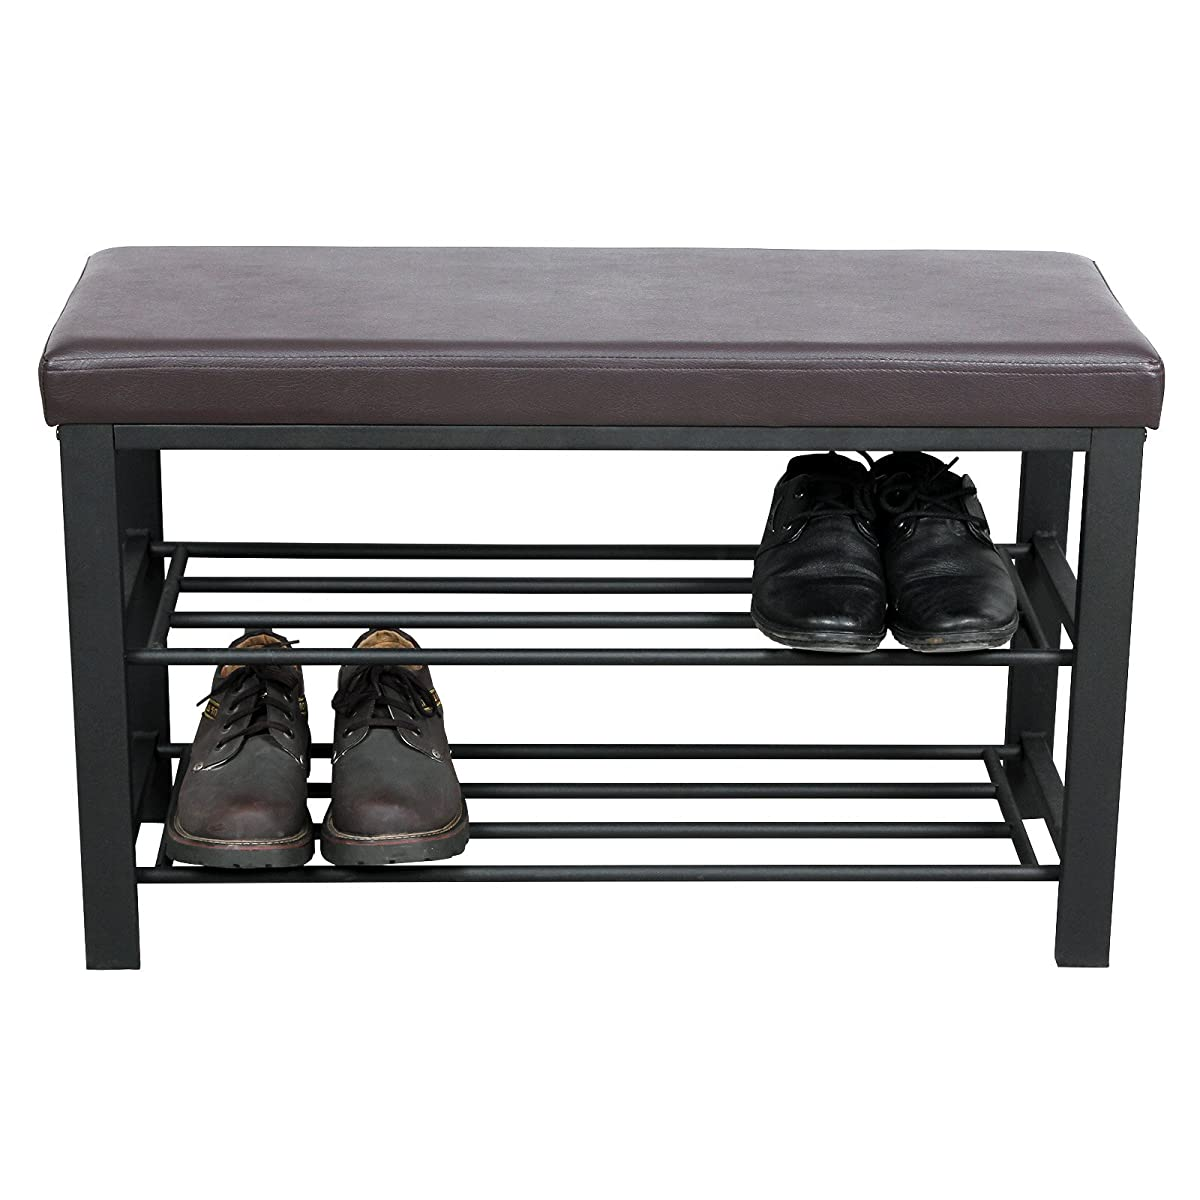 SONGMICS Metal Shoe Bench 2-Tier Shoe Rack Entryway Shoe Storage Organizer Faux Leather Top ULBS58Z